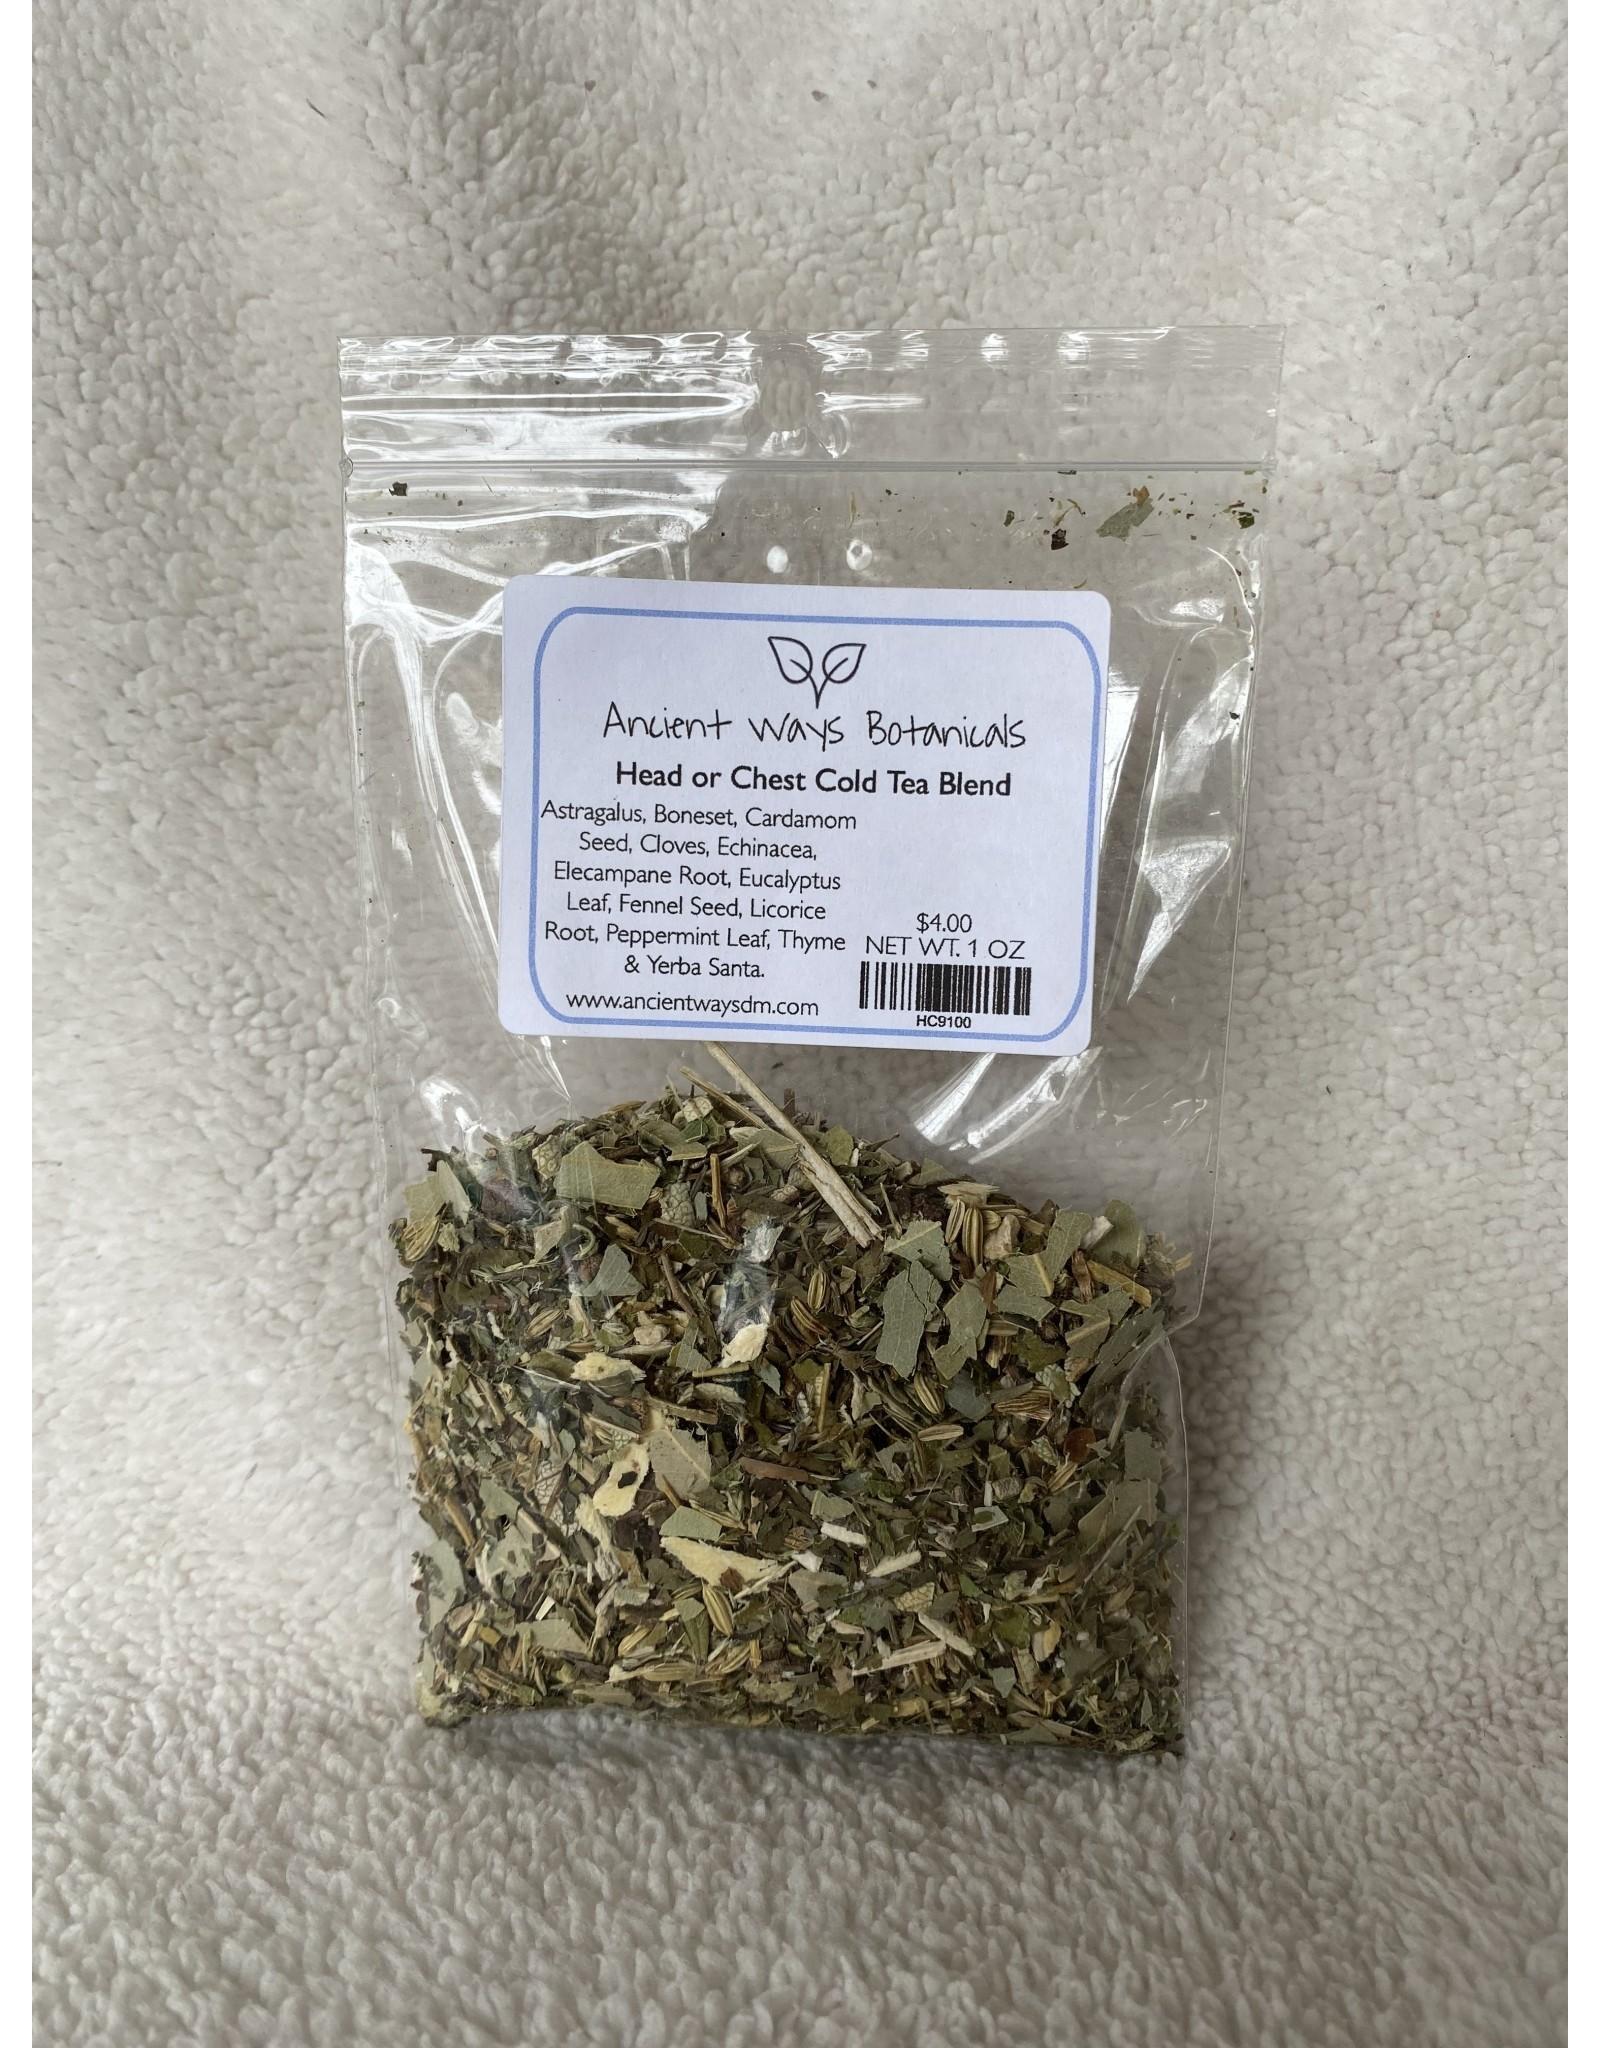 Head or Chest Cold Tea Blend - 1 oz.